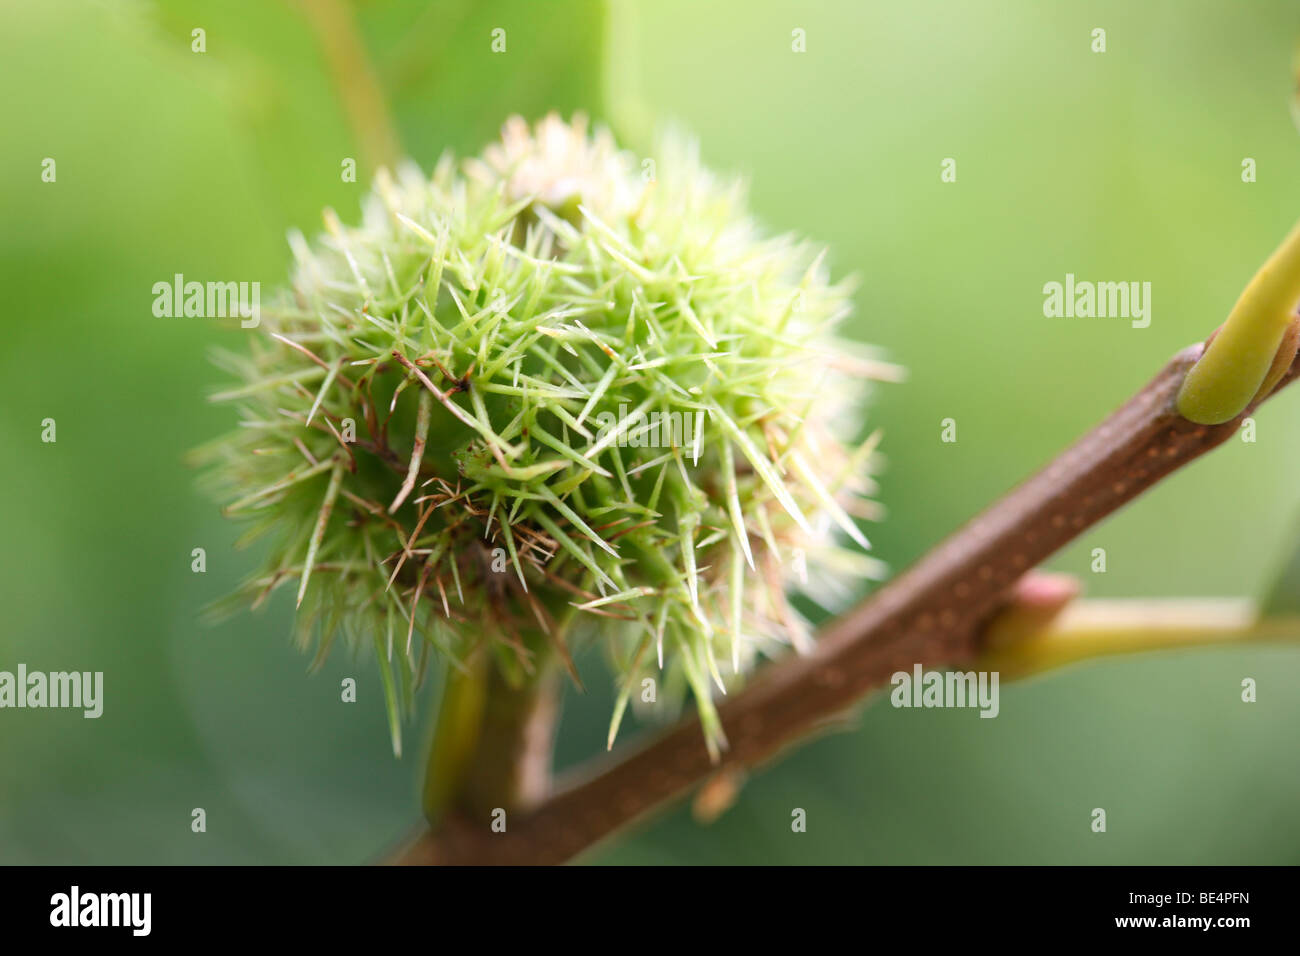 Henry's Chestnut Castanea Henryi Summer to Autumn - fine art photography Jane-Ann Butler Photography JABP593 - Stock Image